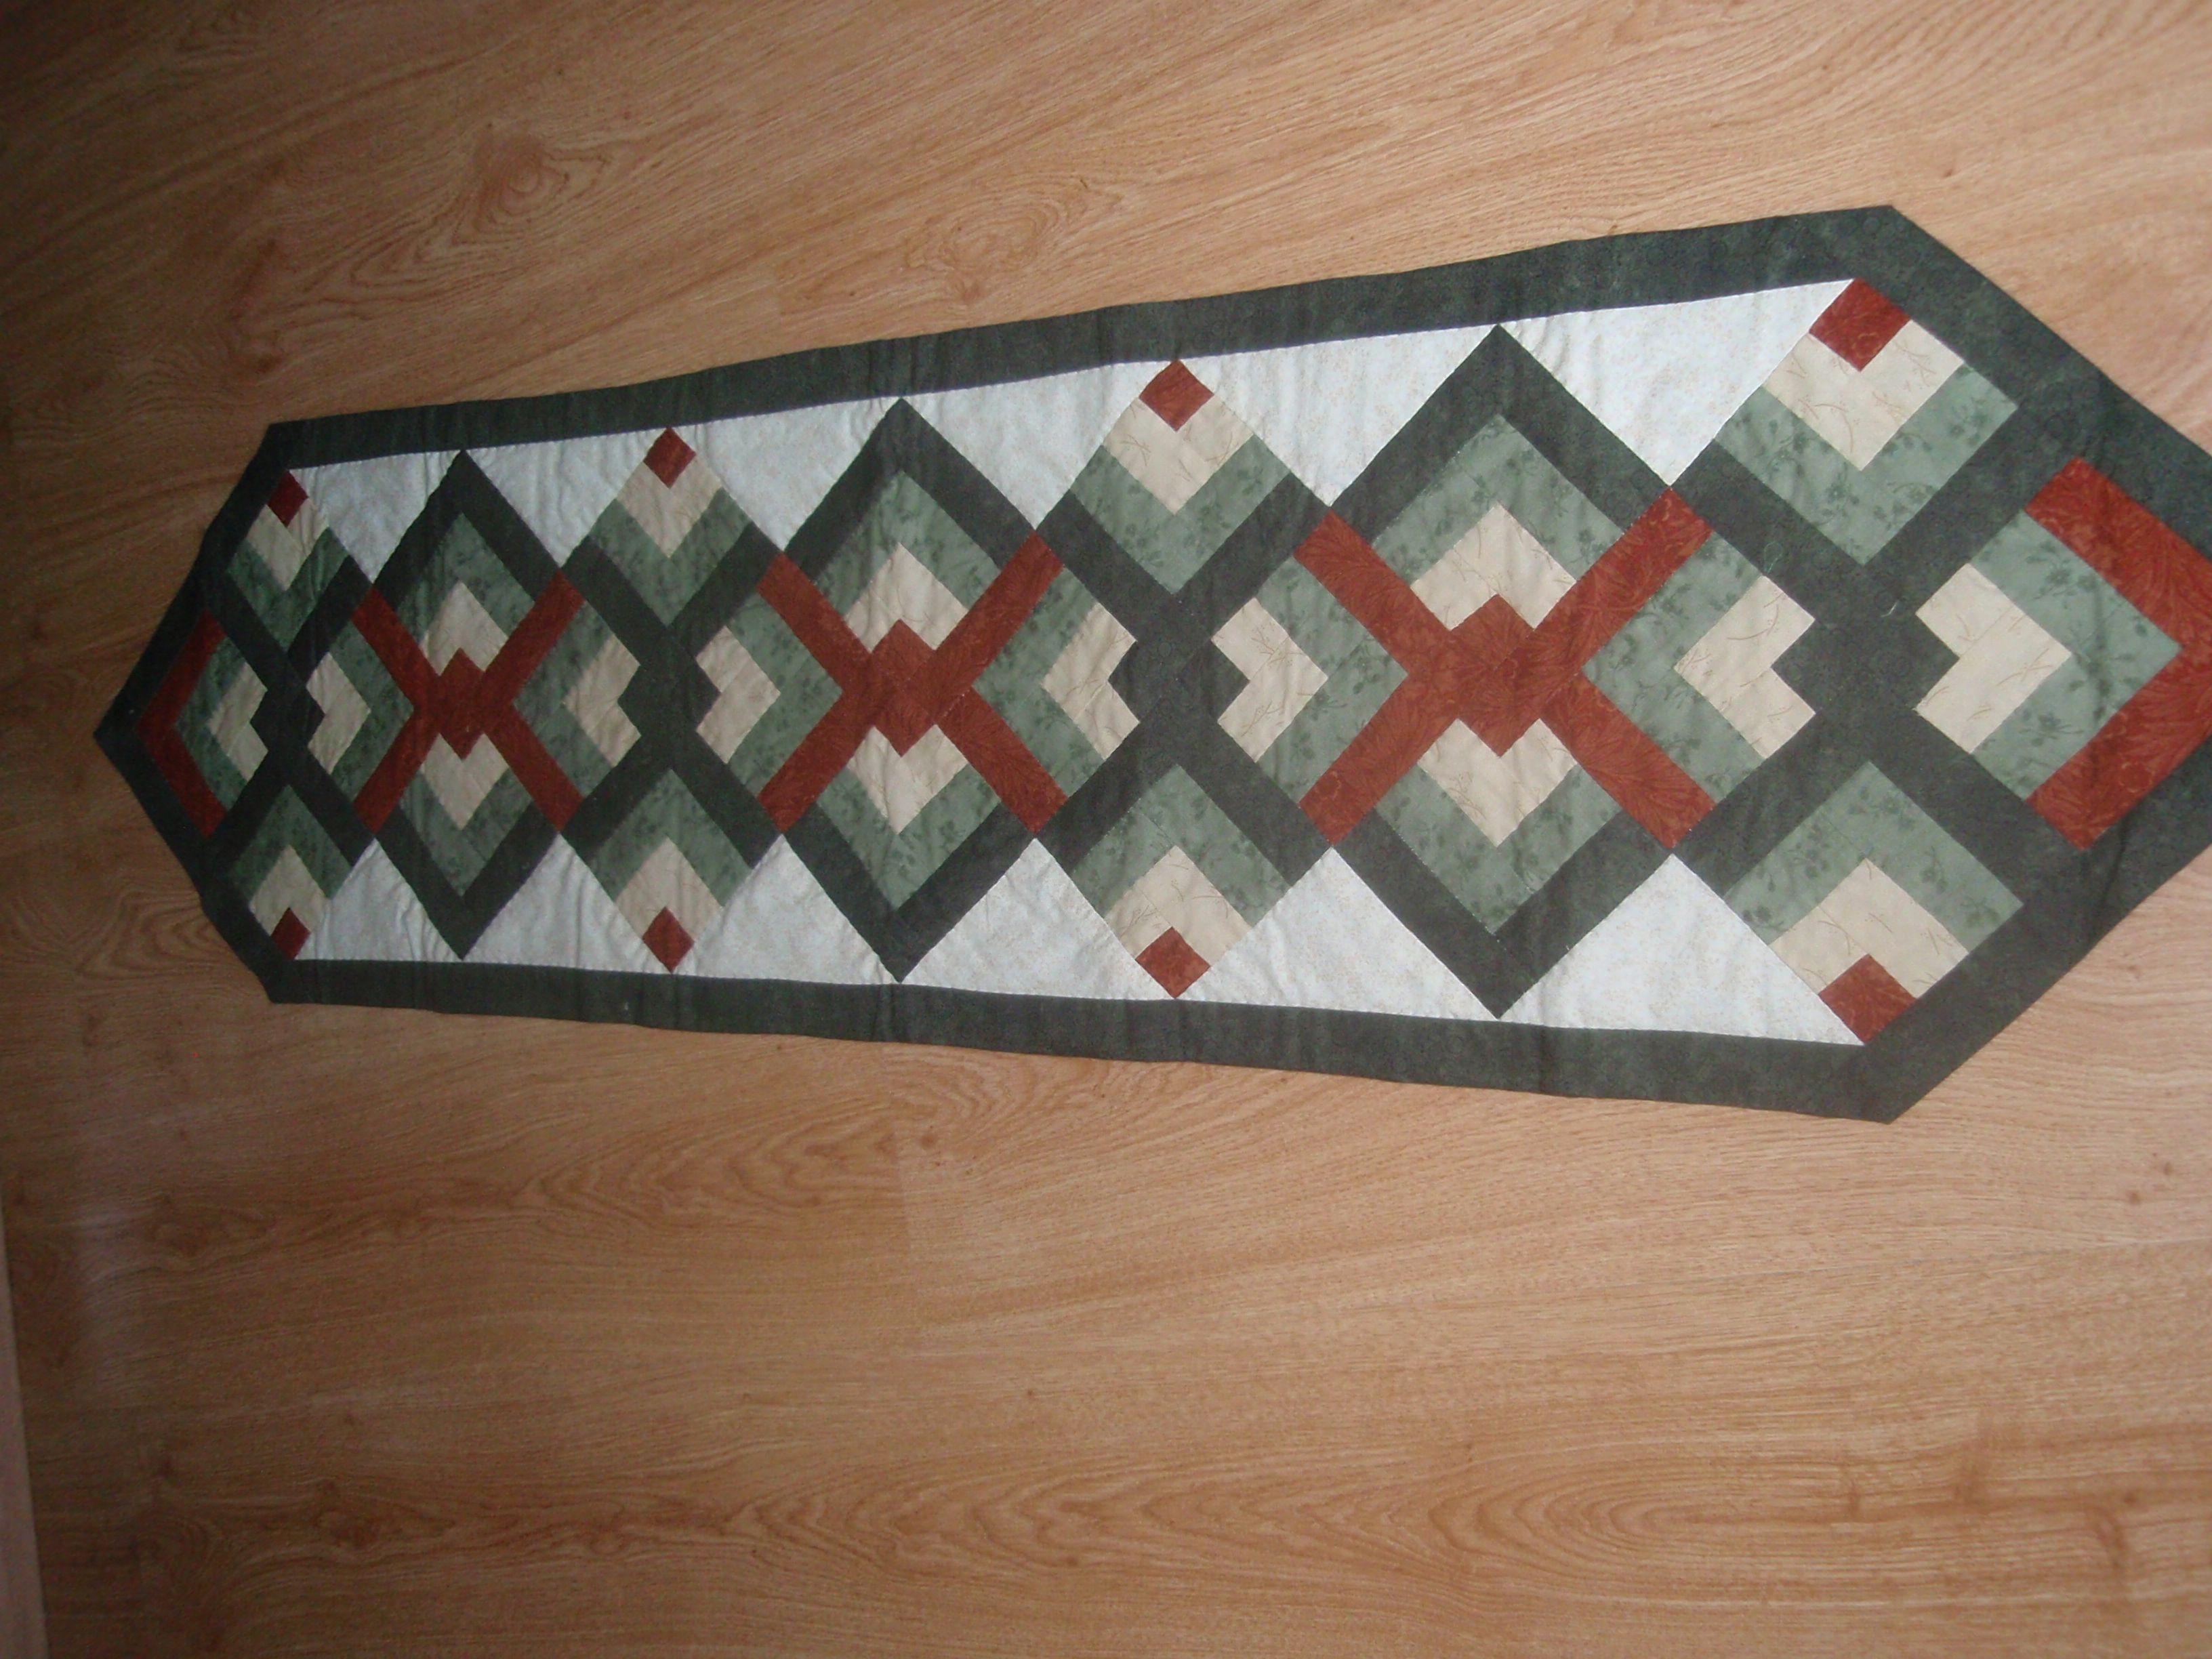 Camino de mesa patchwork pinterest caminos de mesa - Camino mesa patchwork ...